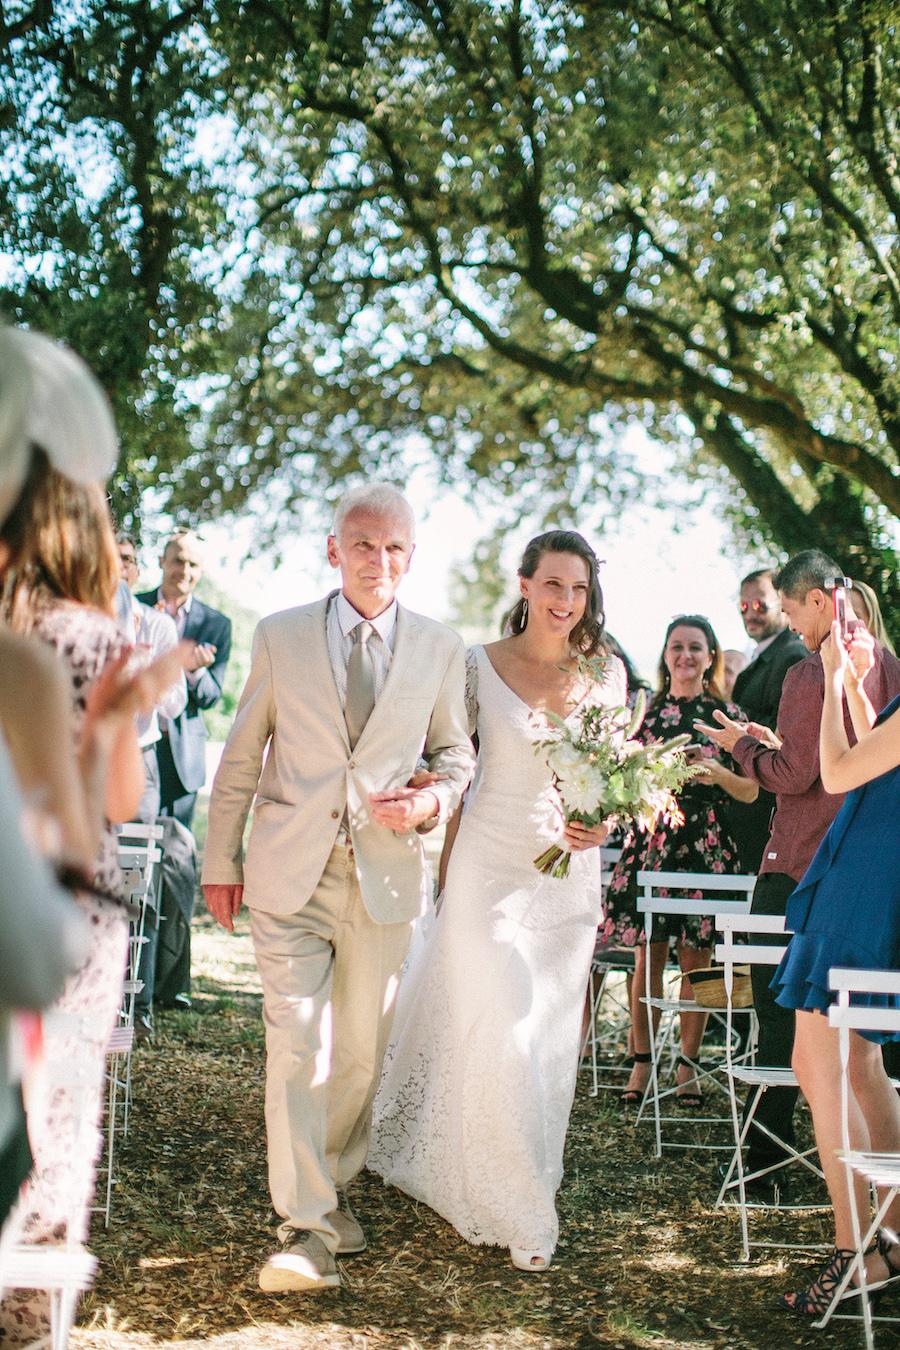 saya-photography-rustic-french-wedding-provence-domaines-de-patras-75.jpg